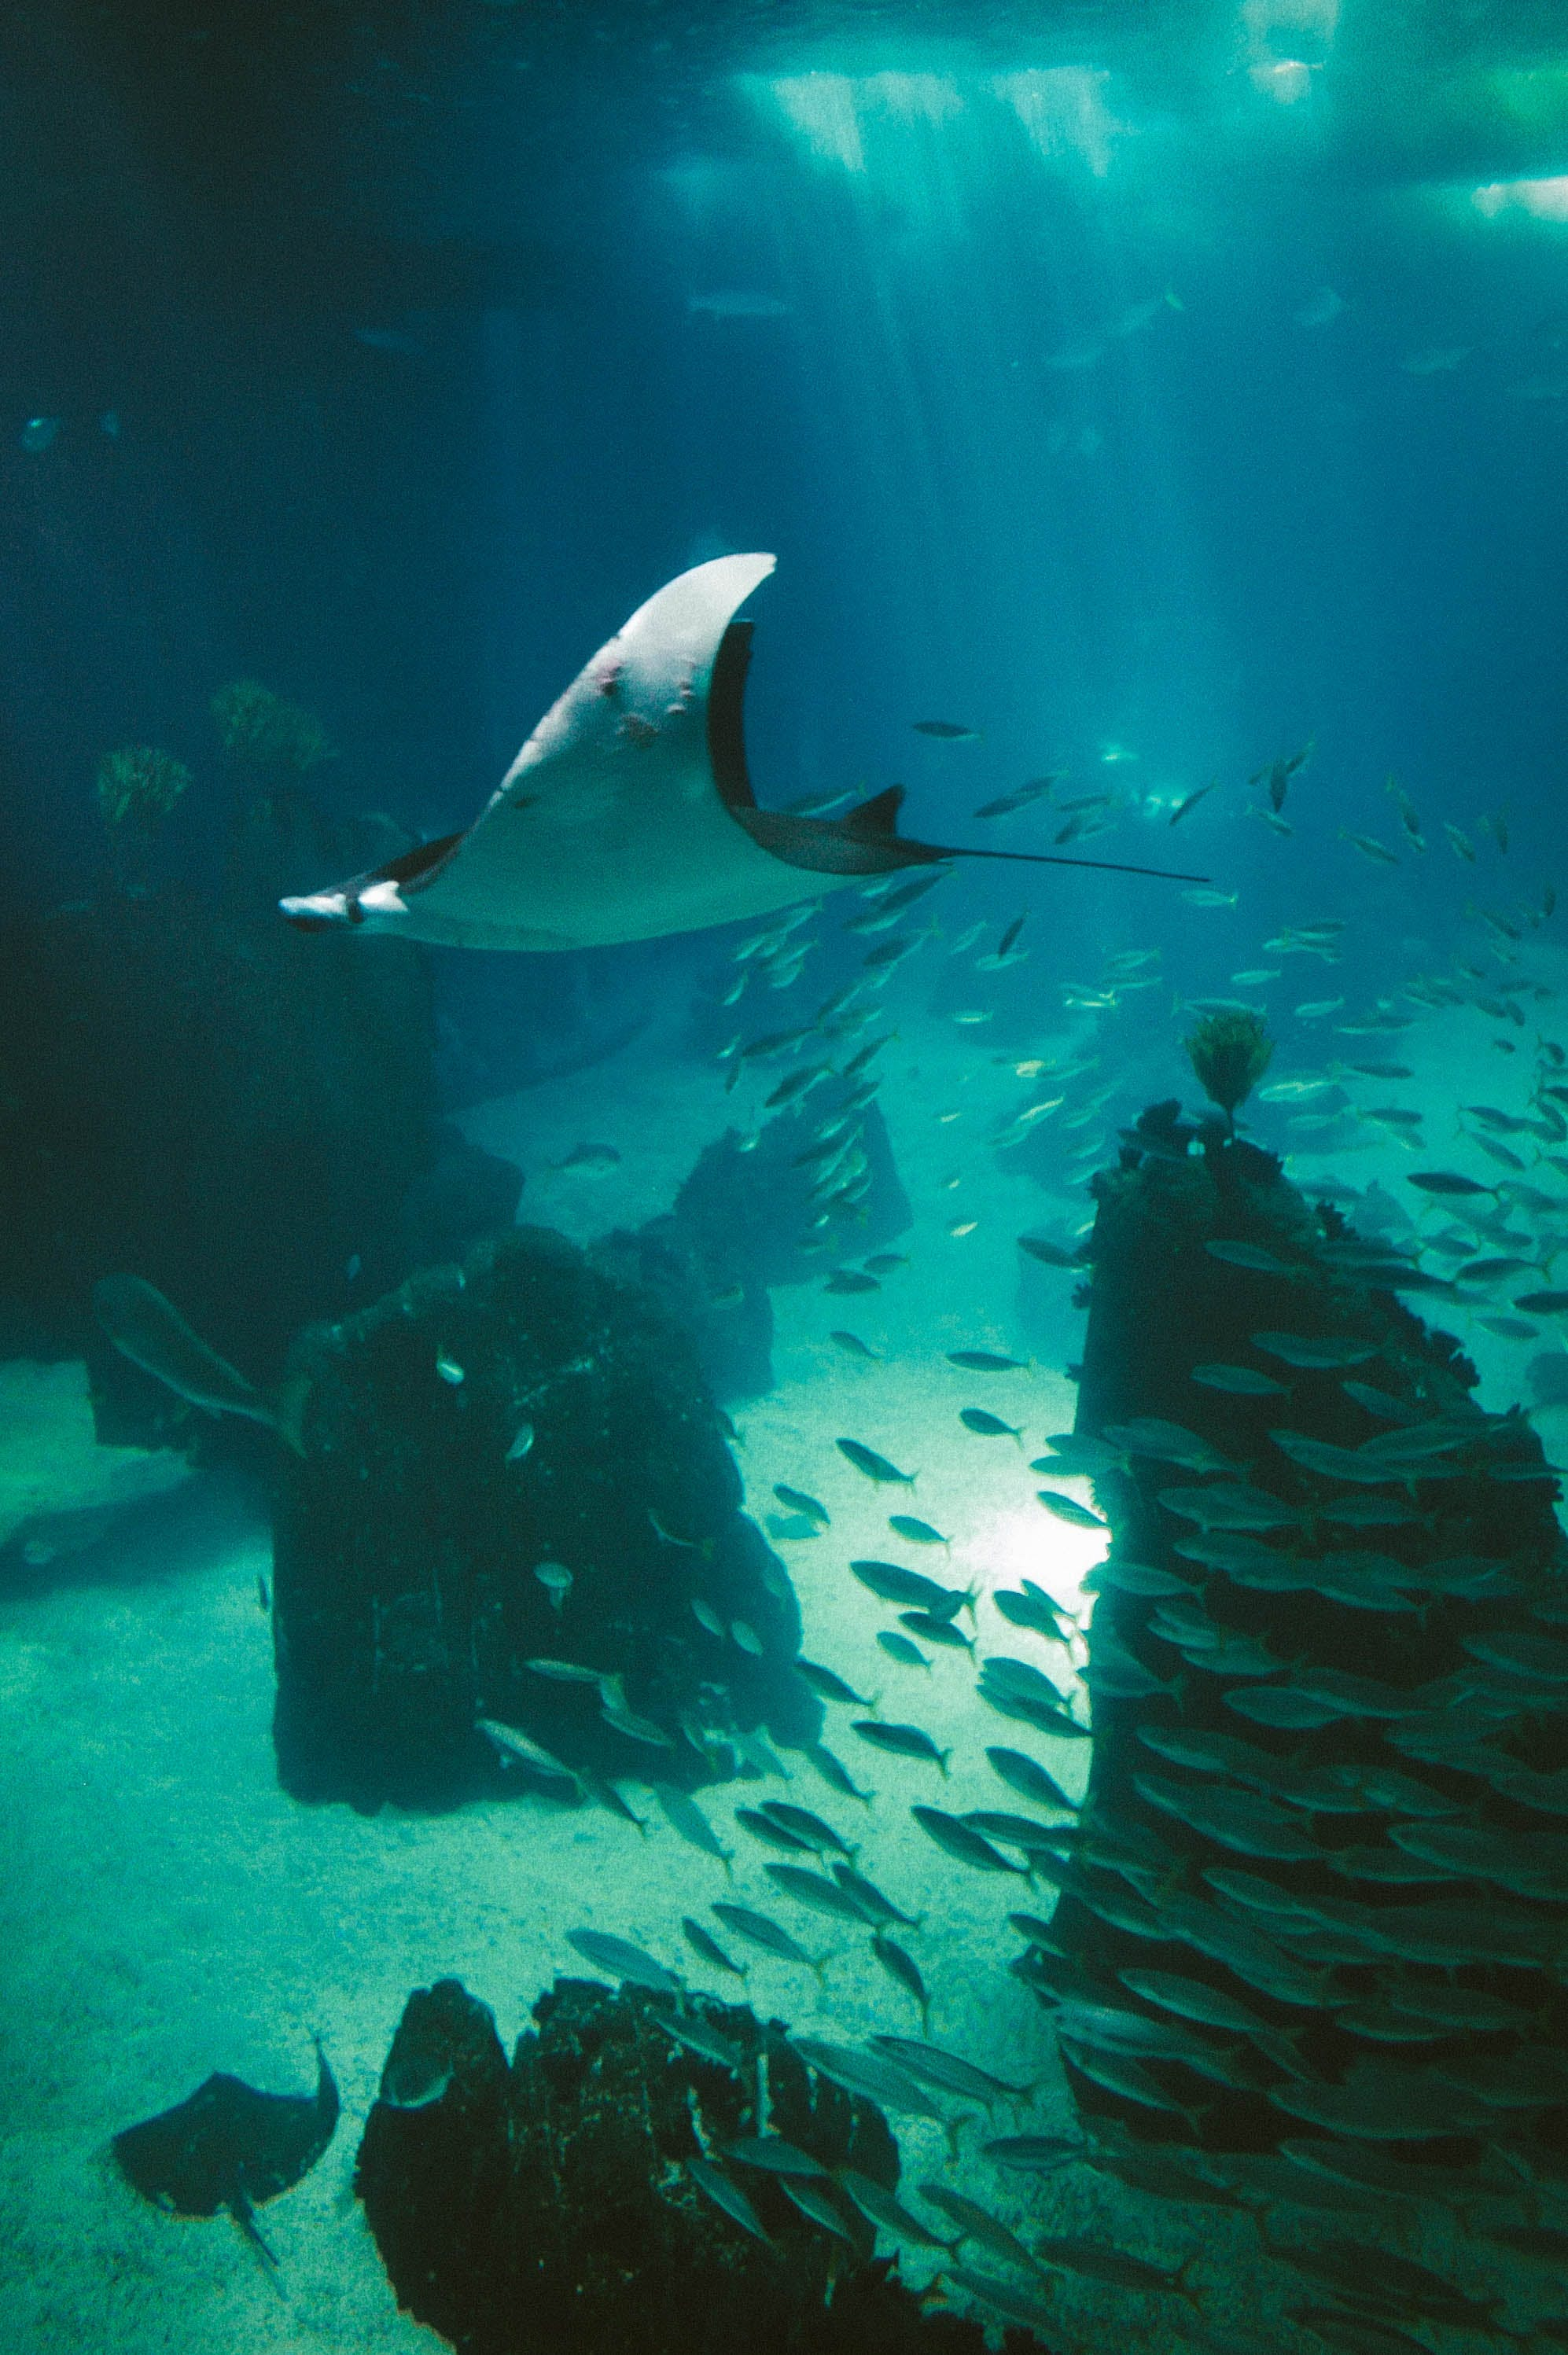 Free stock photo of deep ocean, fish, light beam, manta ray